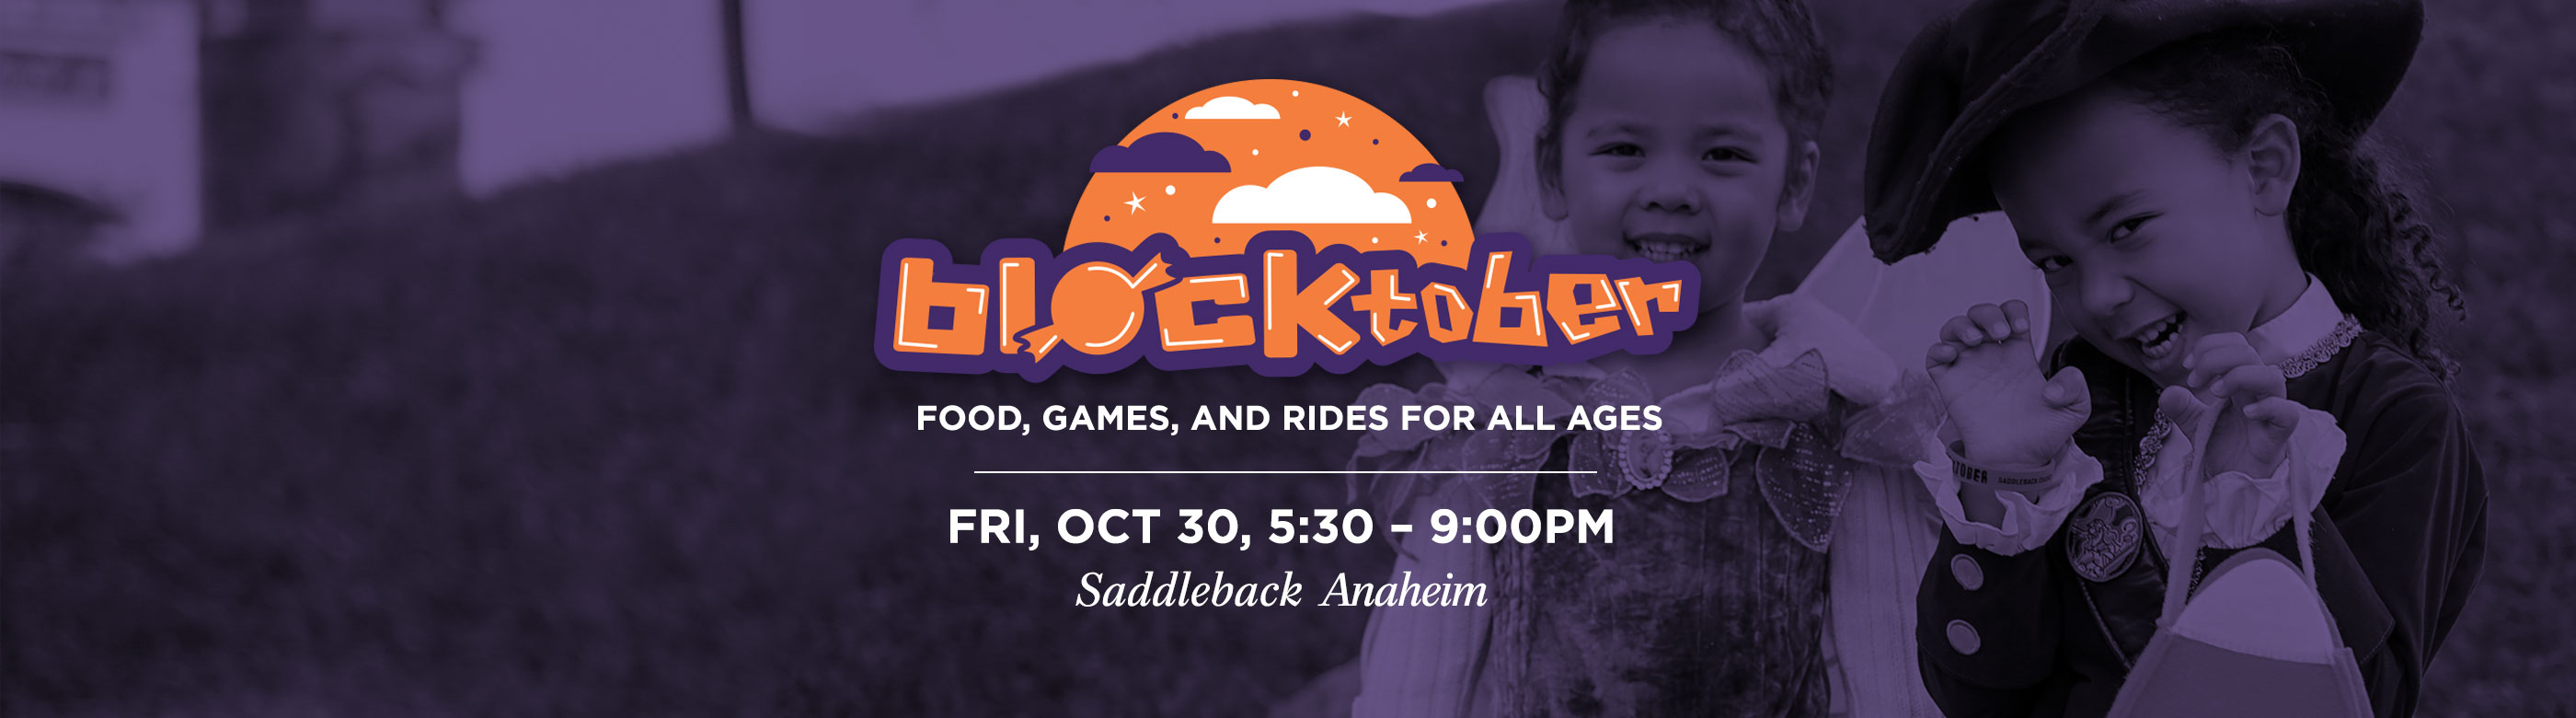 Saddleback Church: Events: Blocktober at Saddleback Anaheim